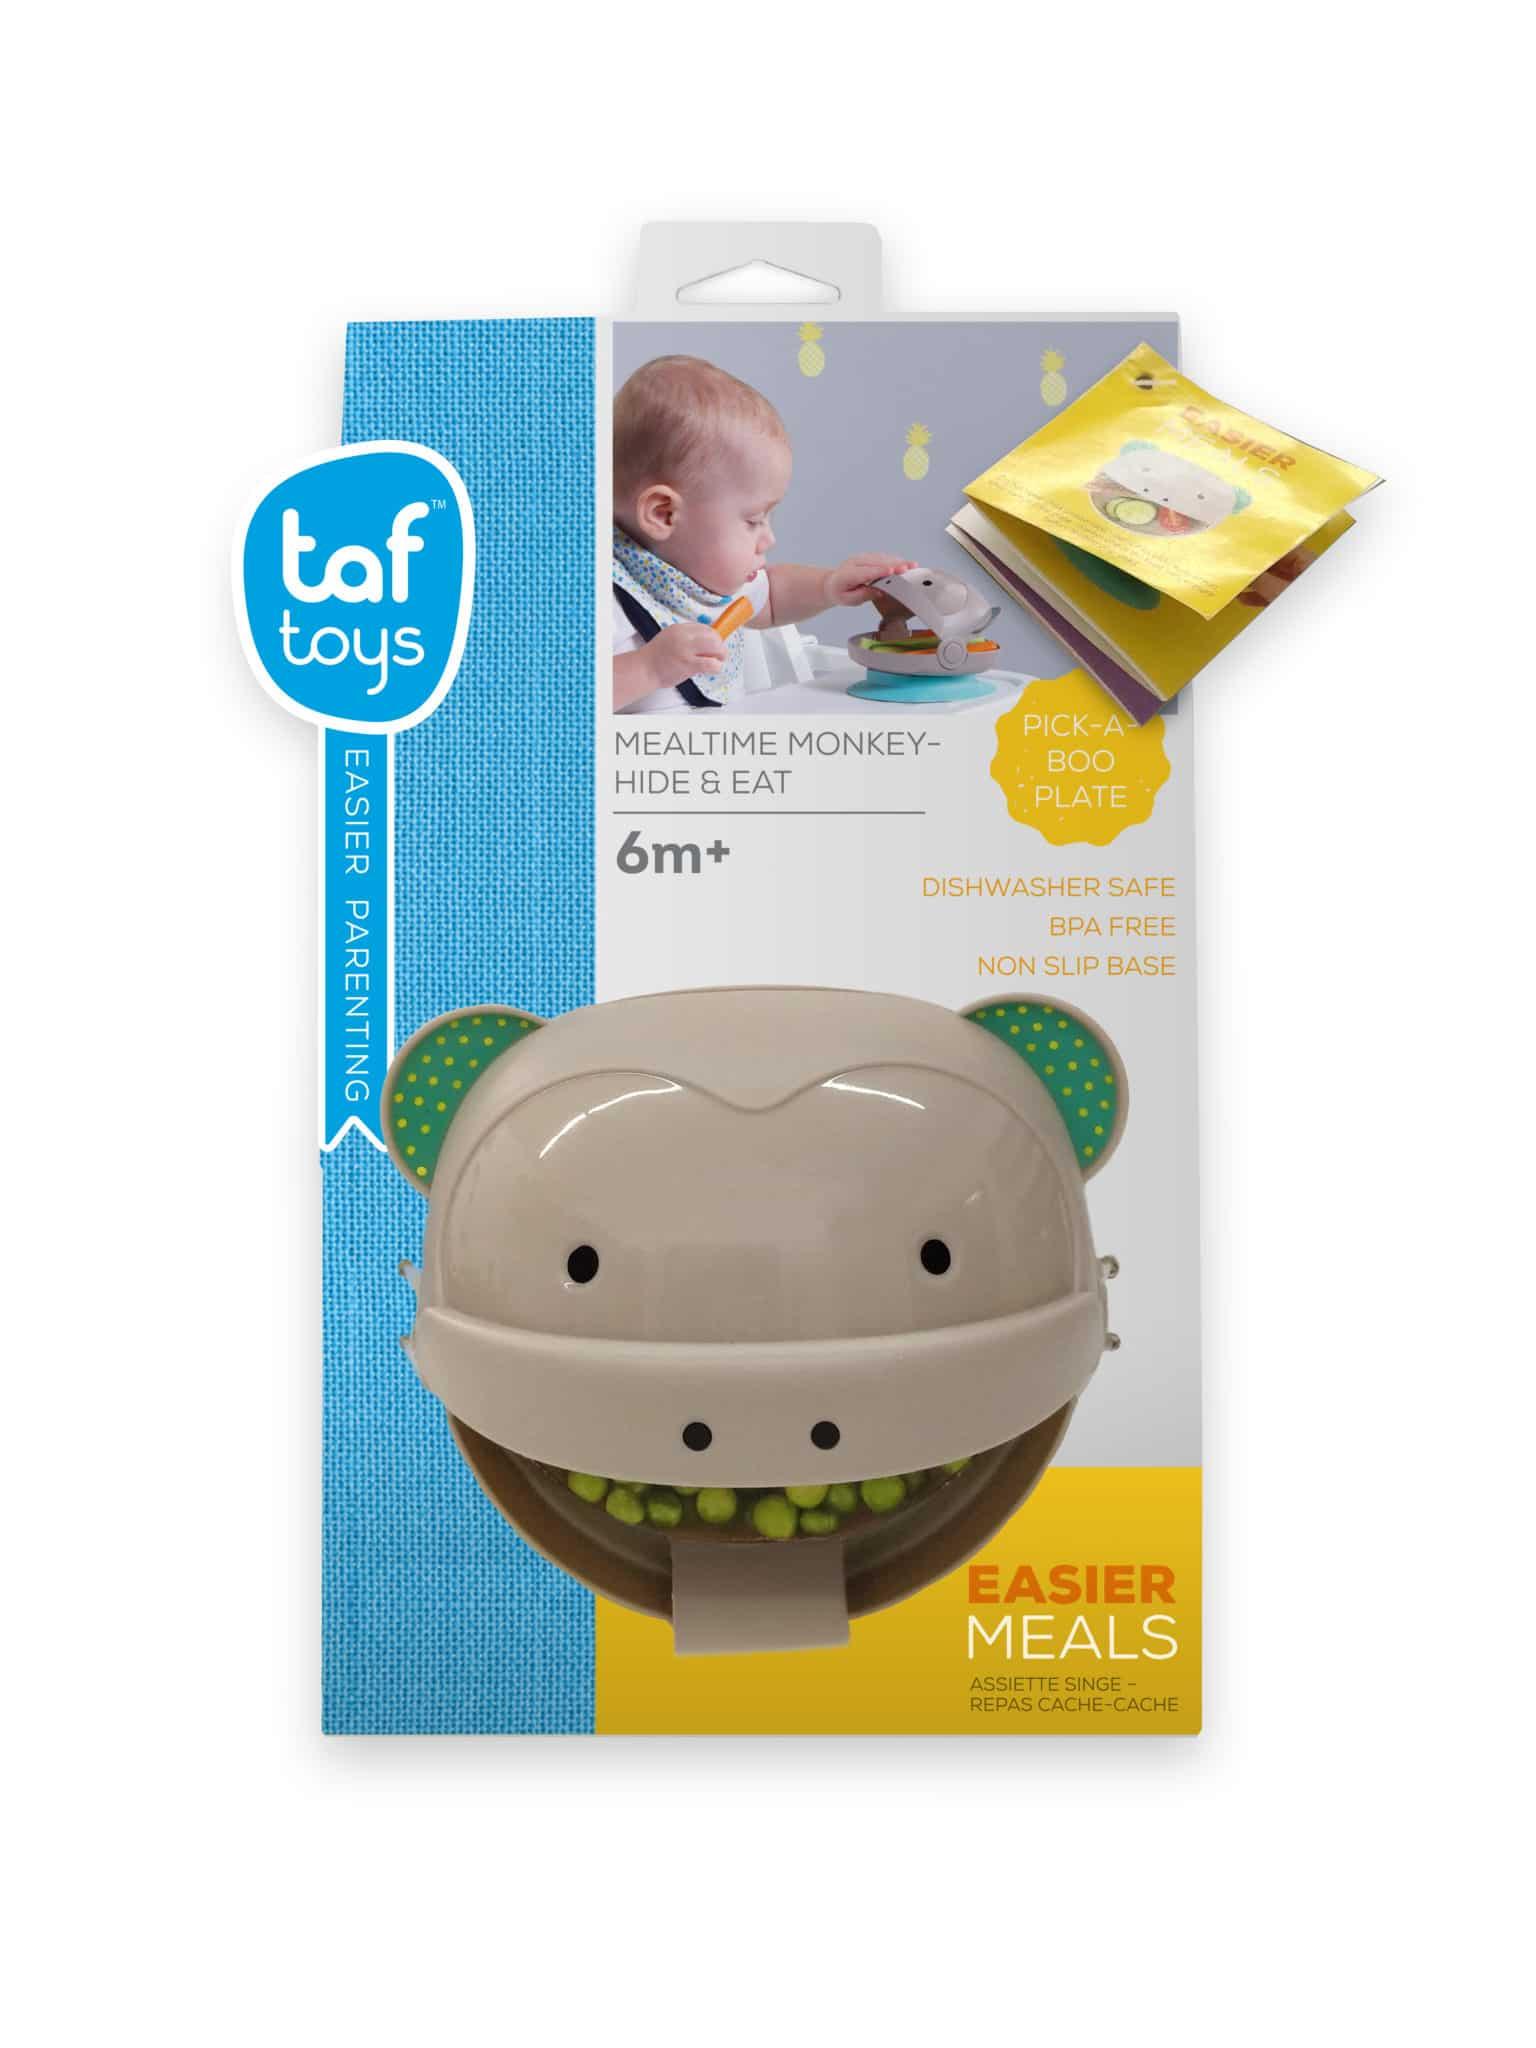 Mealtime Monkey Hide & Eat Pack